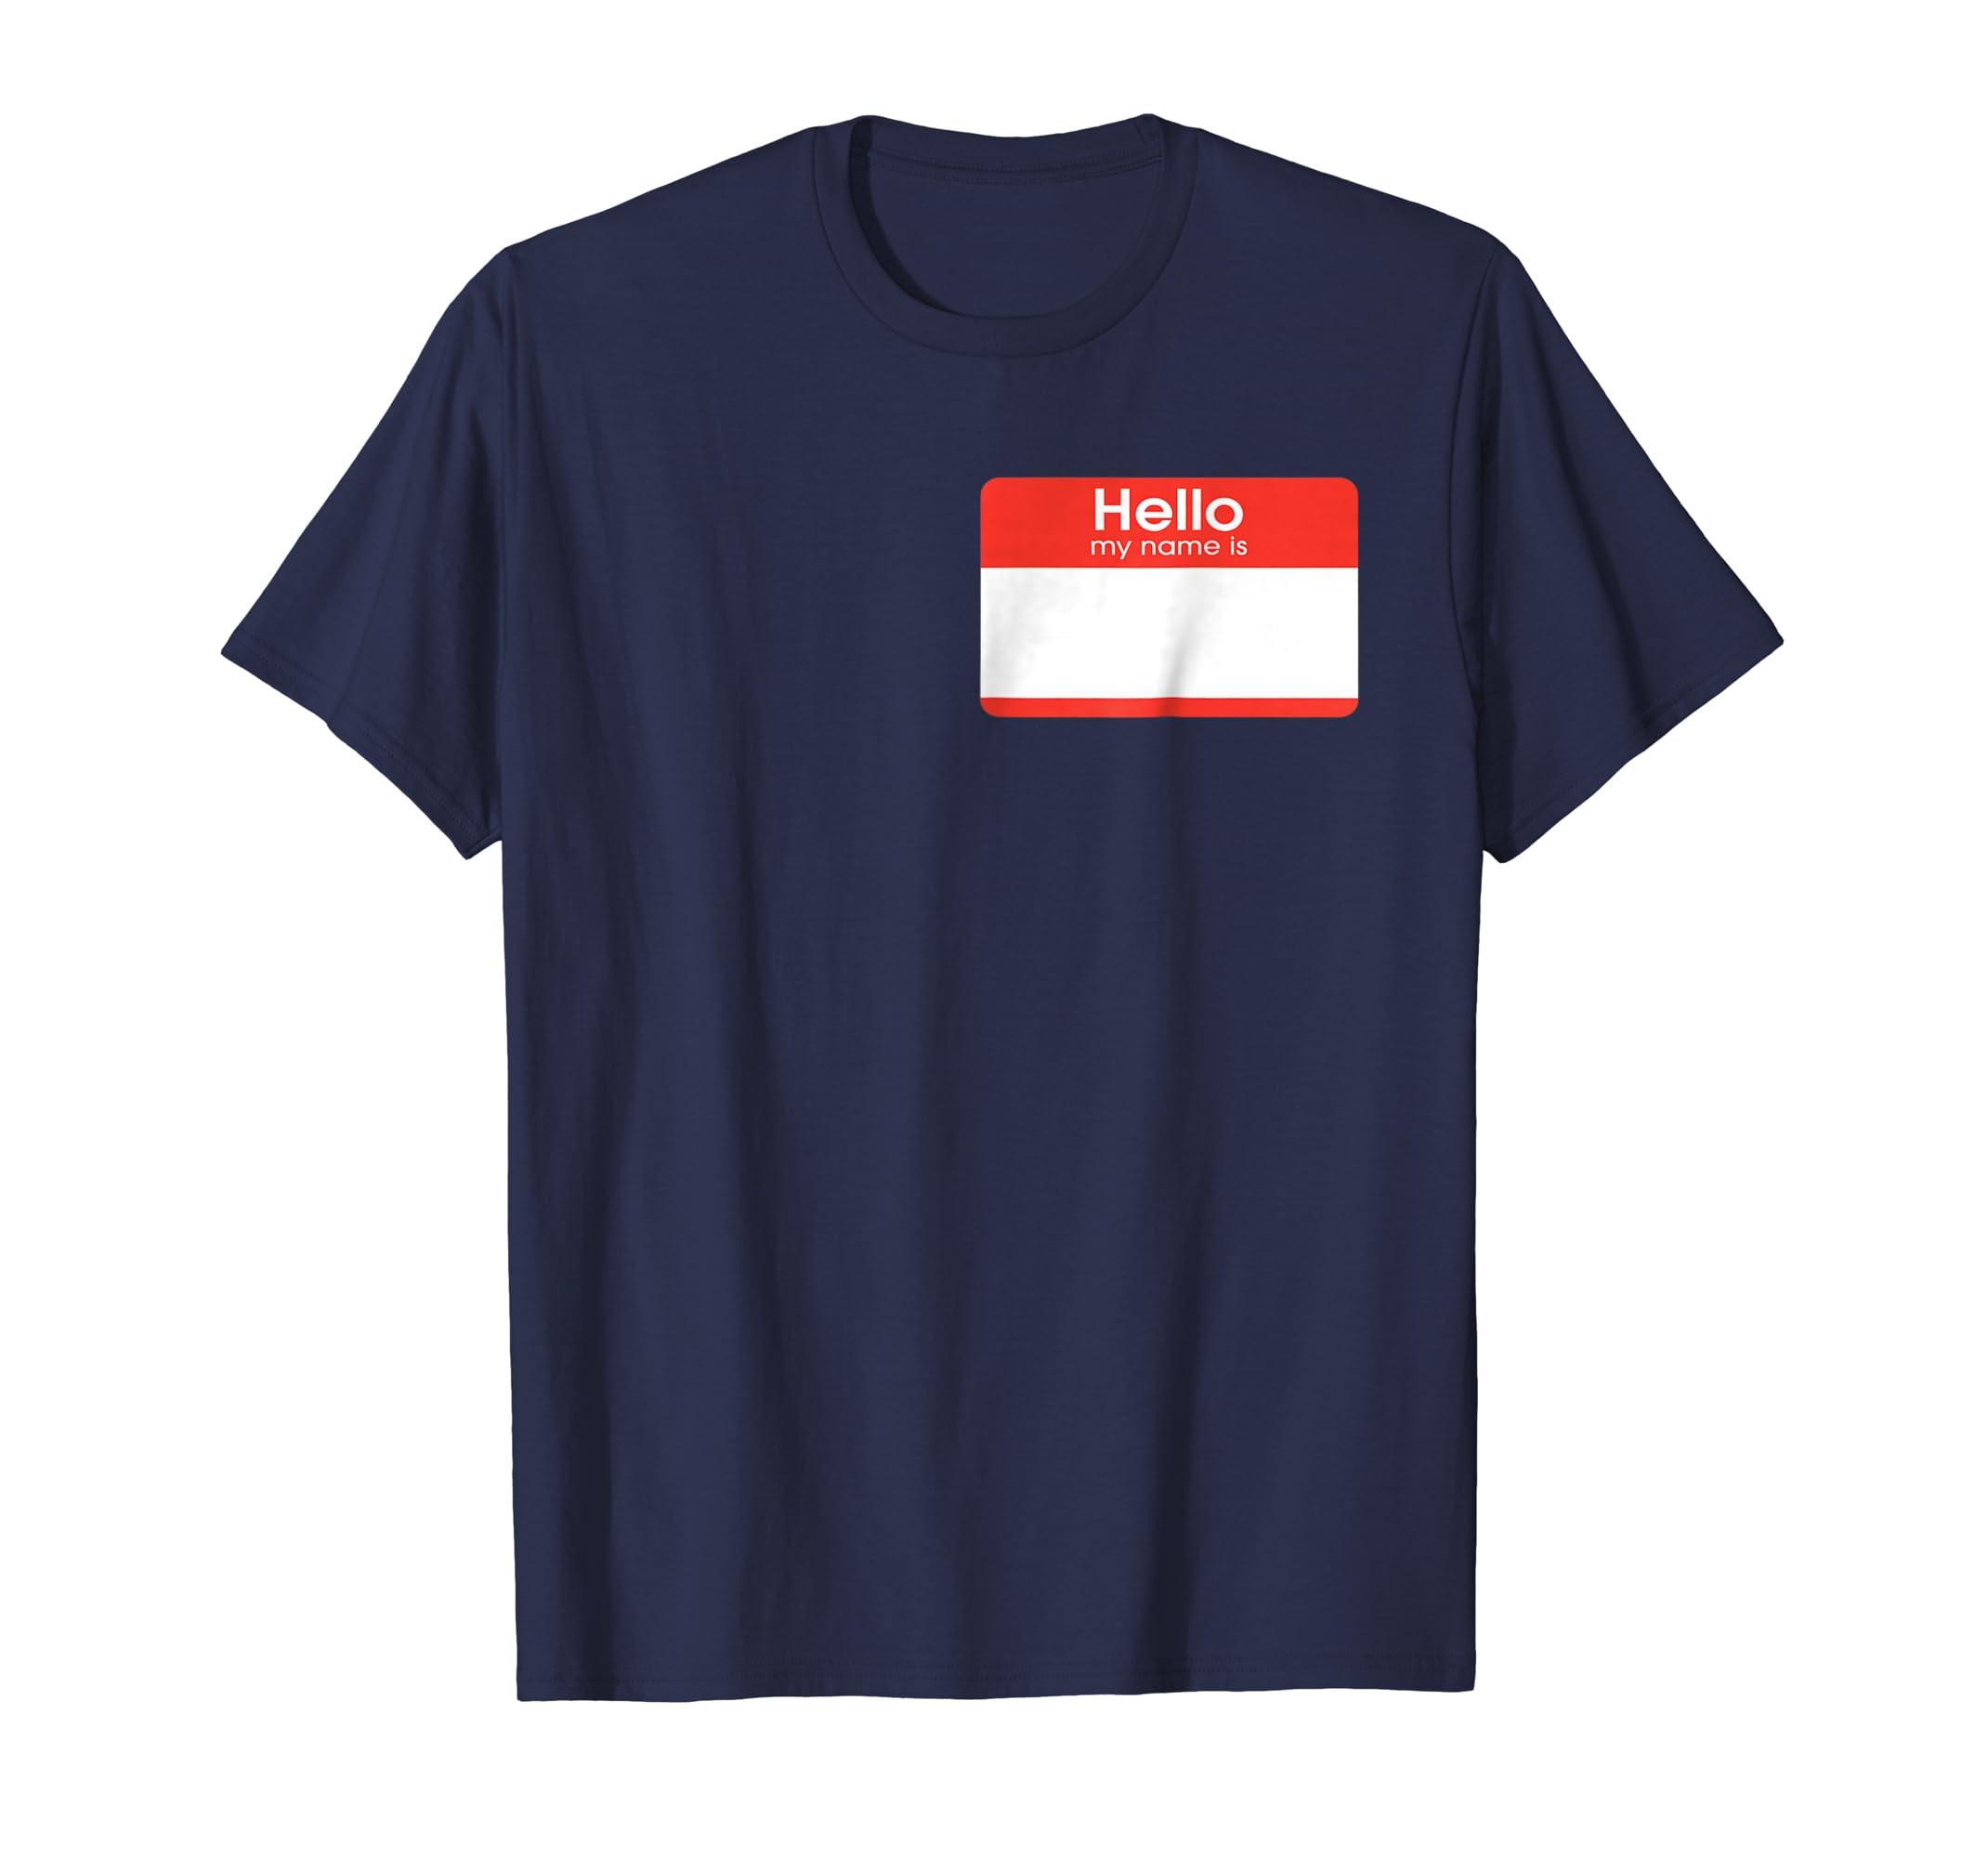 b70617ccb Amazon.com: Custom T-shirt - Hello My Name Is: Clothing